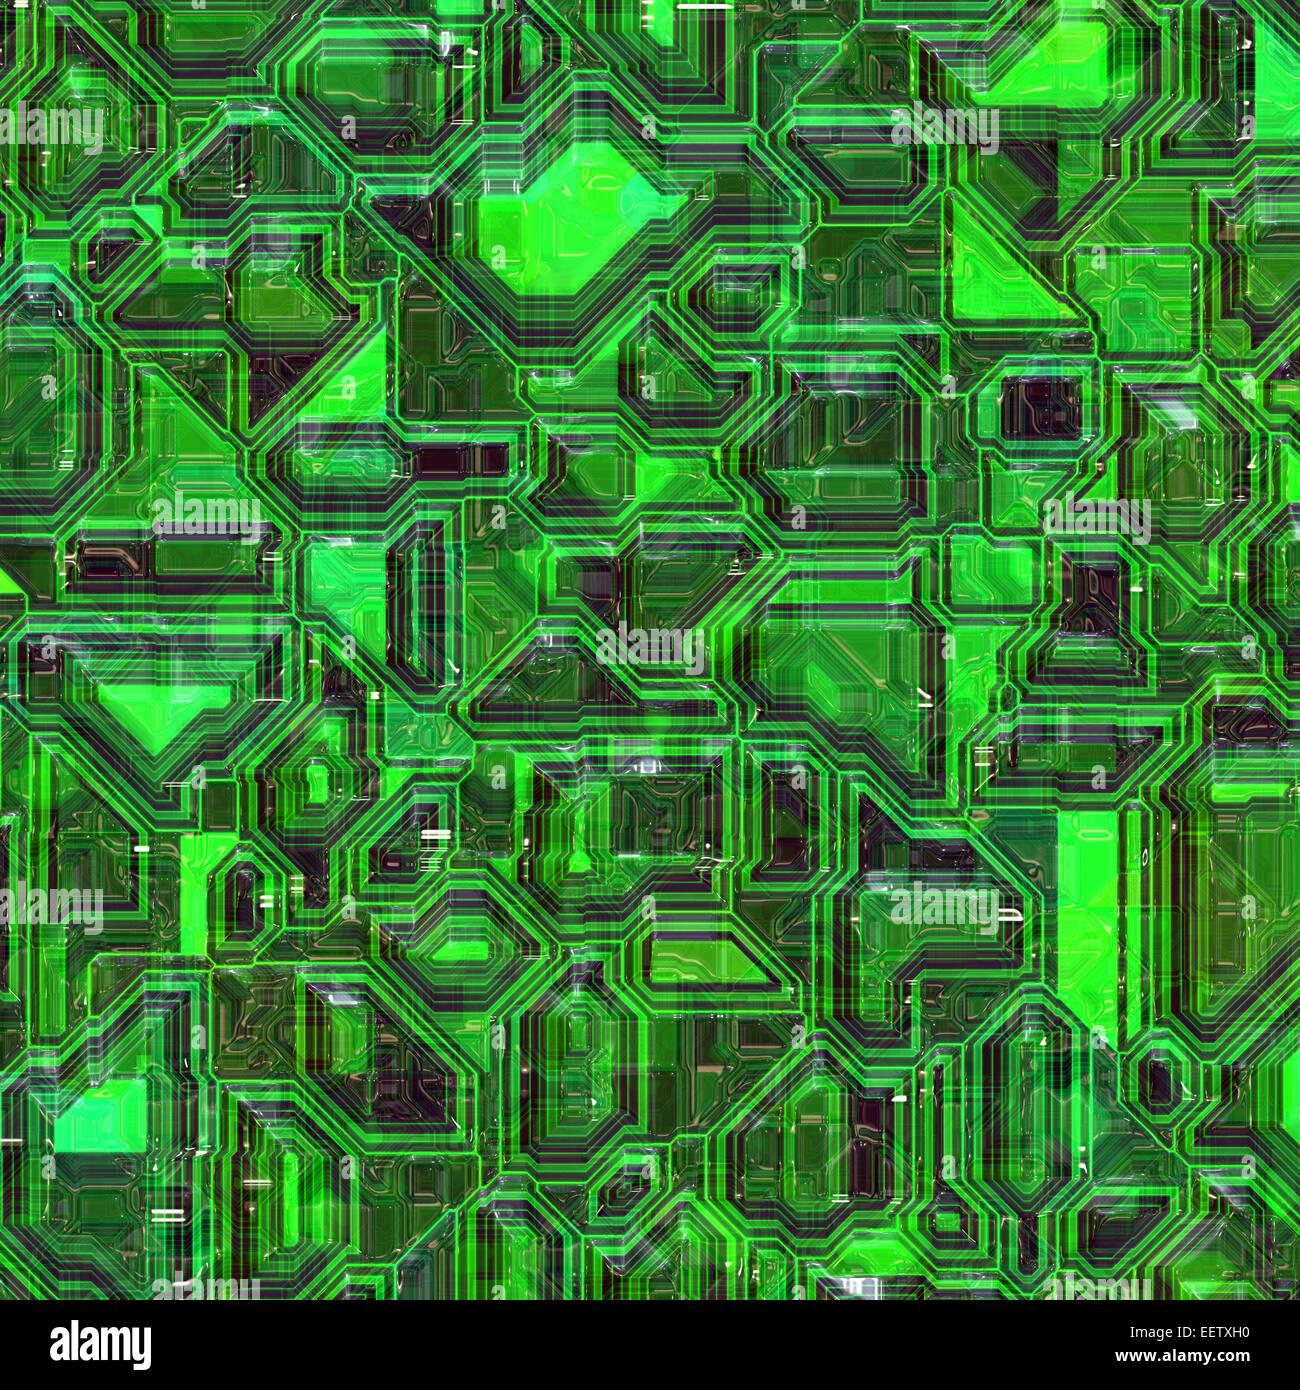 Integrated Circuit Board Stock Photos Circuitboard Green Colored Closeup View Image